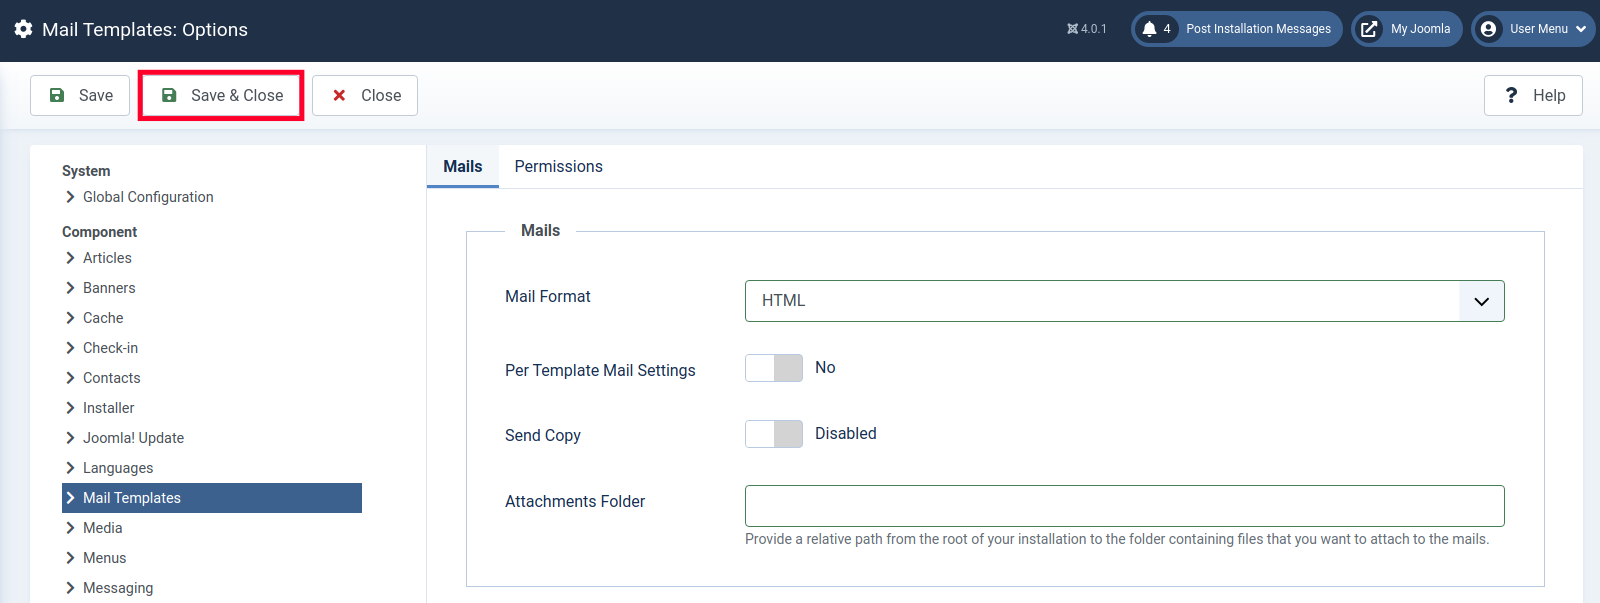 Save & Close HTML Templates in Joomla 4